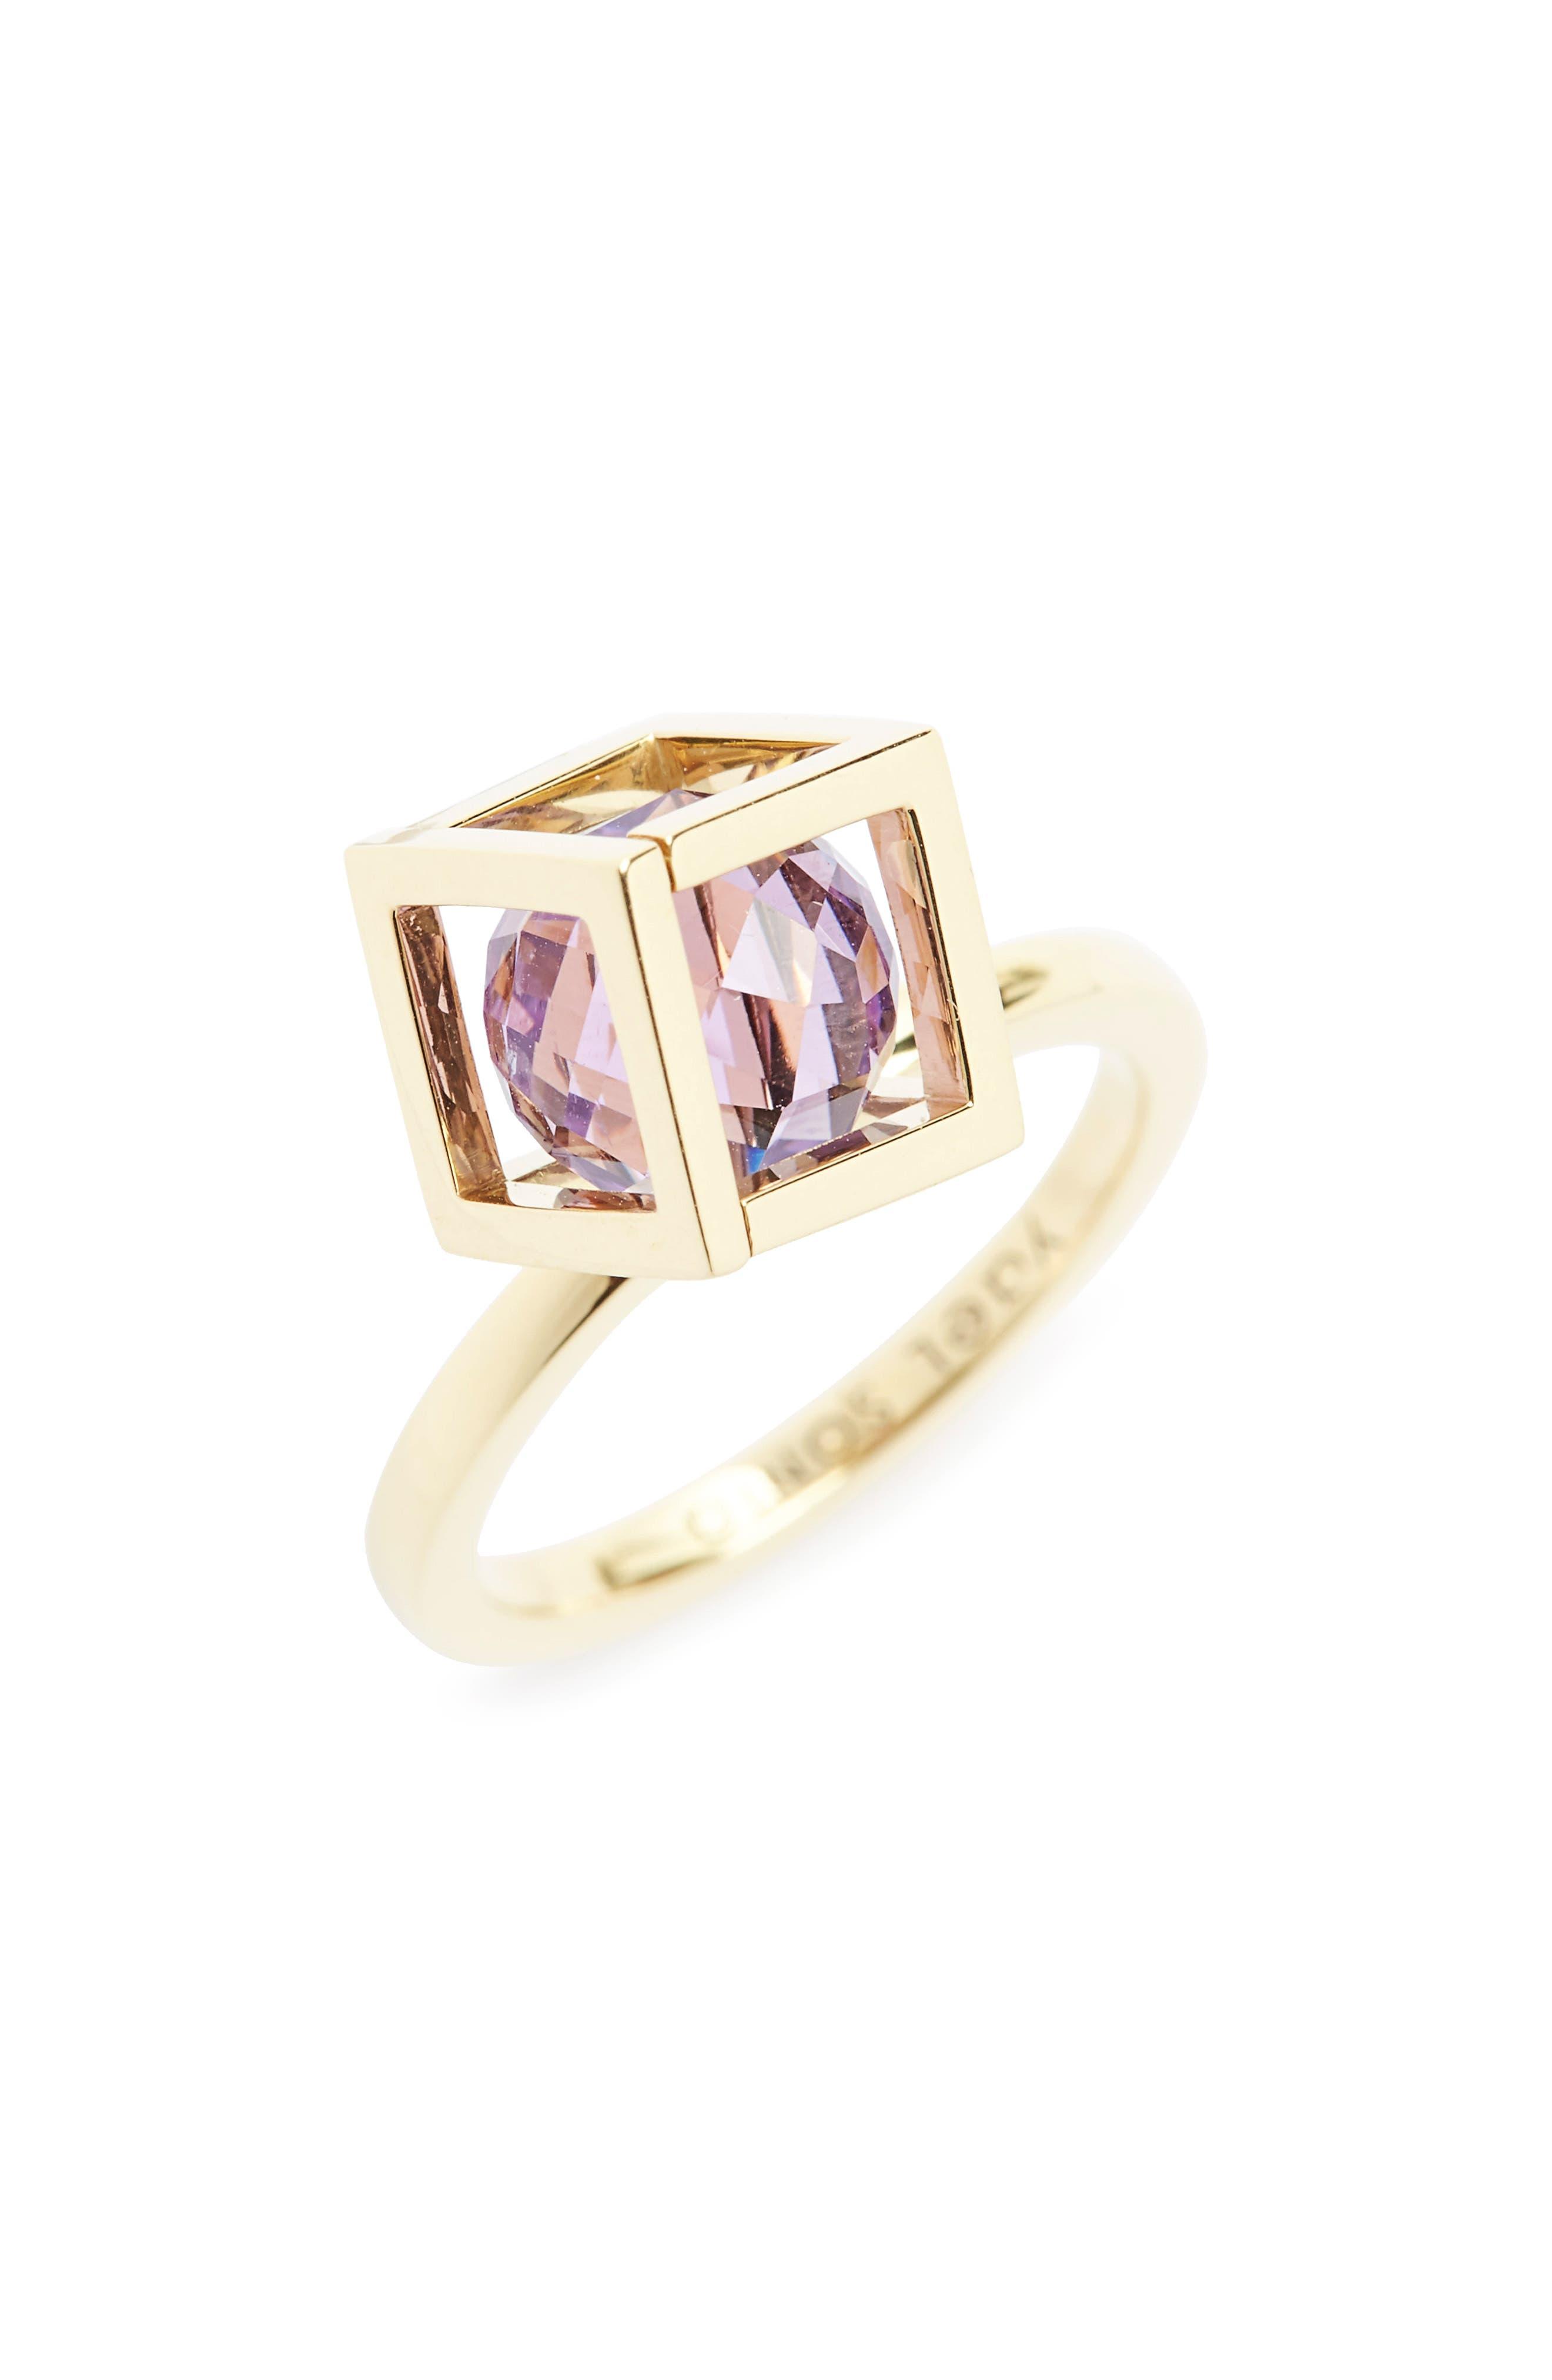 Main Image - Yael Sonia Rotated Solo Amethyst Ring